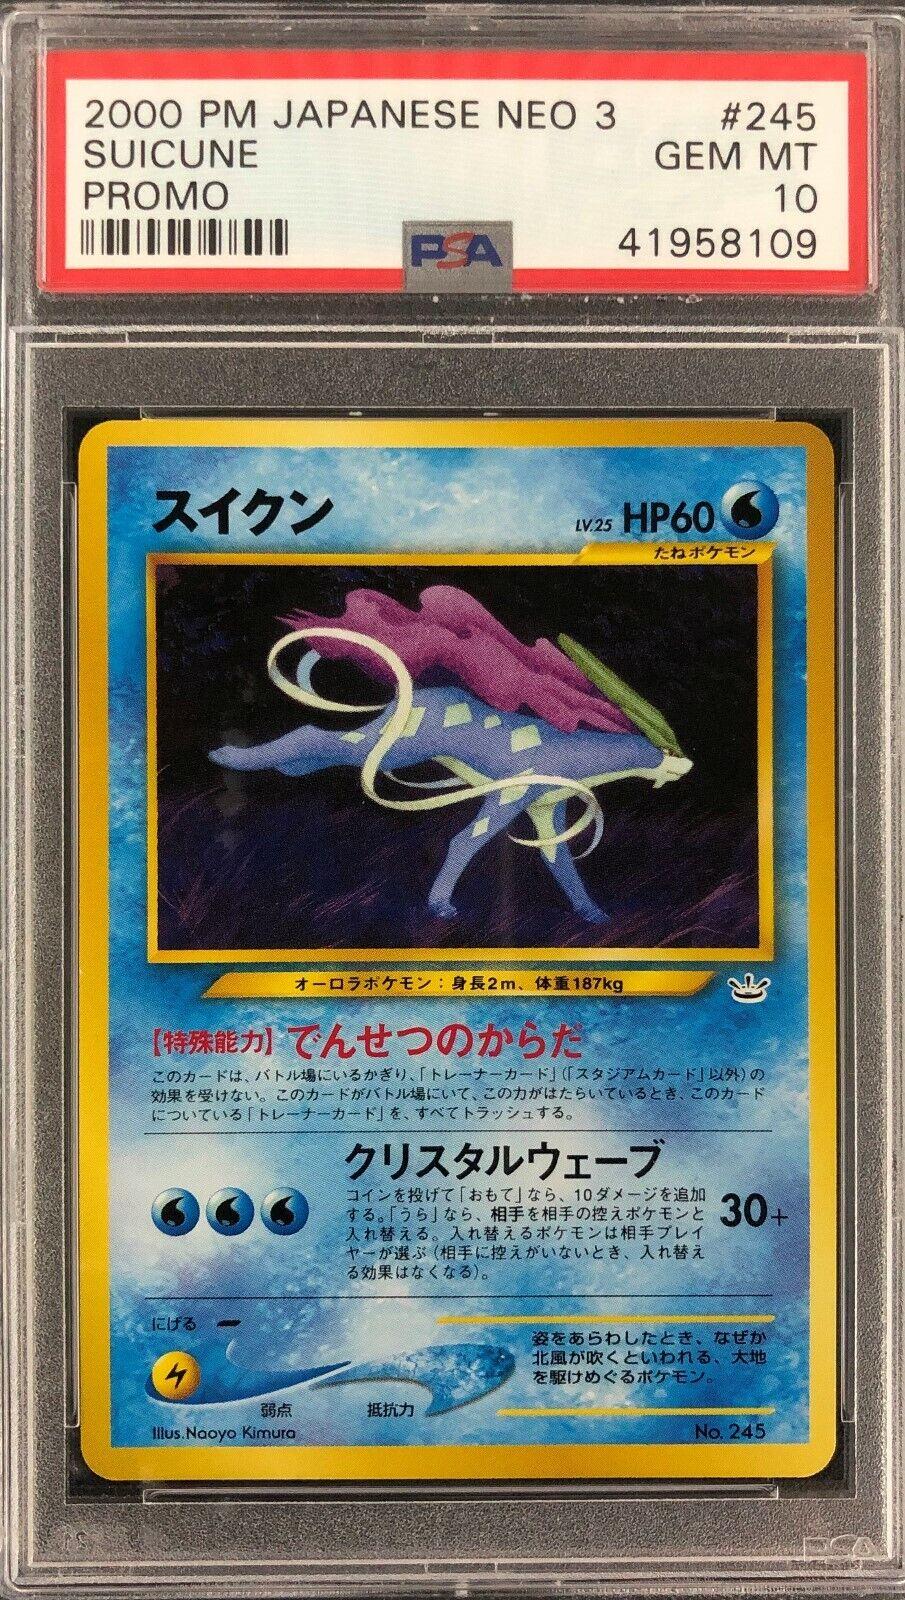 Japanese Suicune Promo Pokemon Card Mint PSA 10